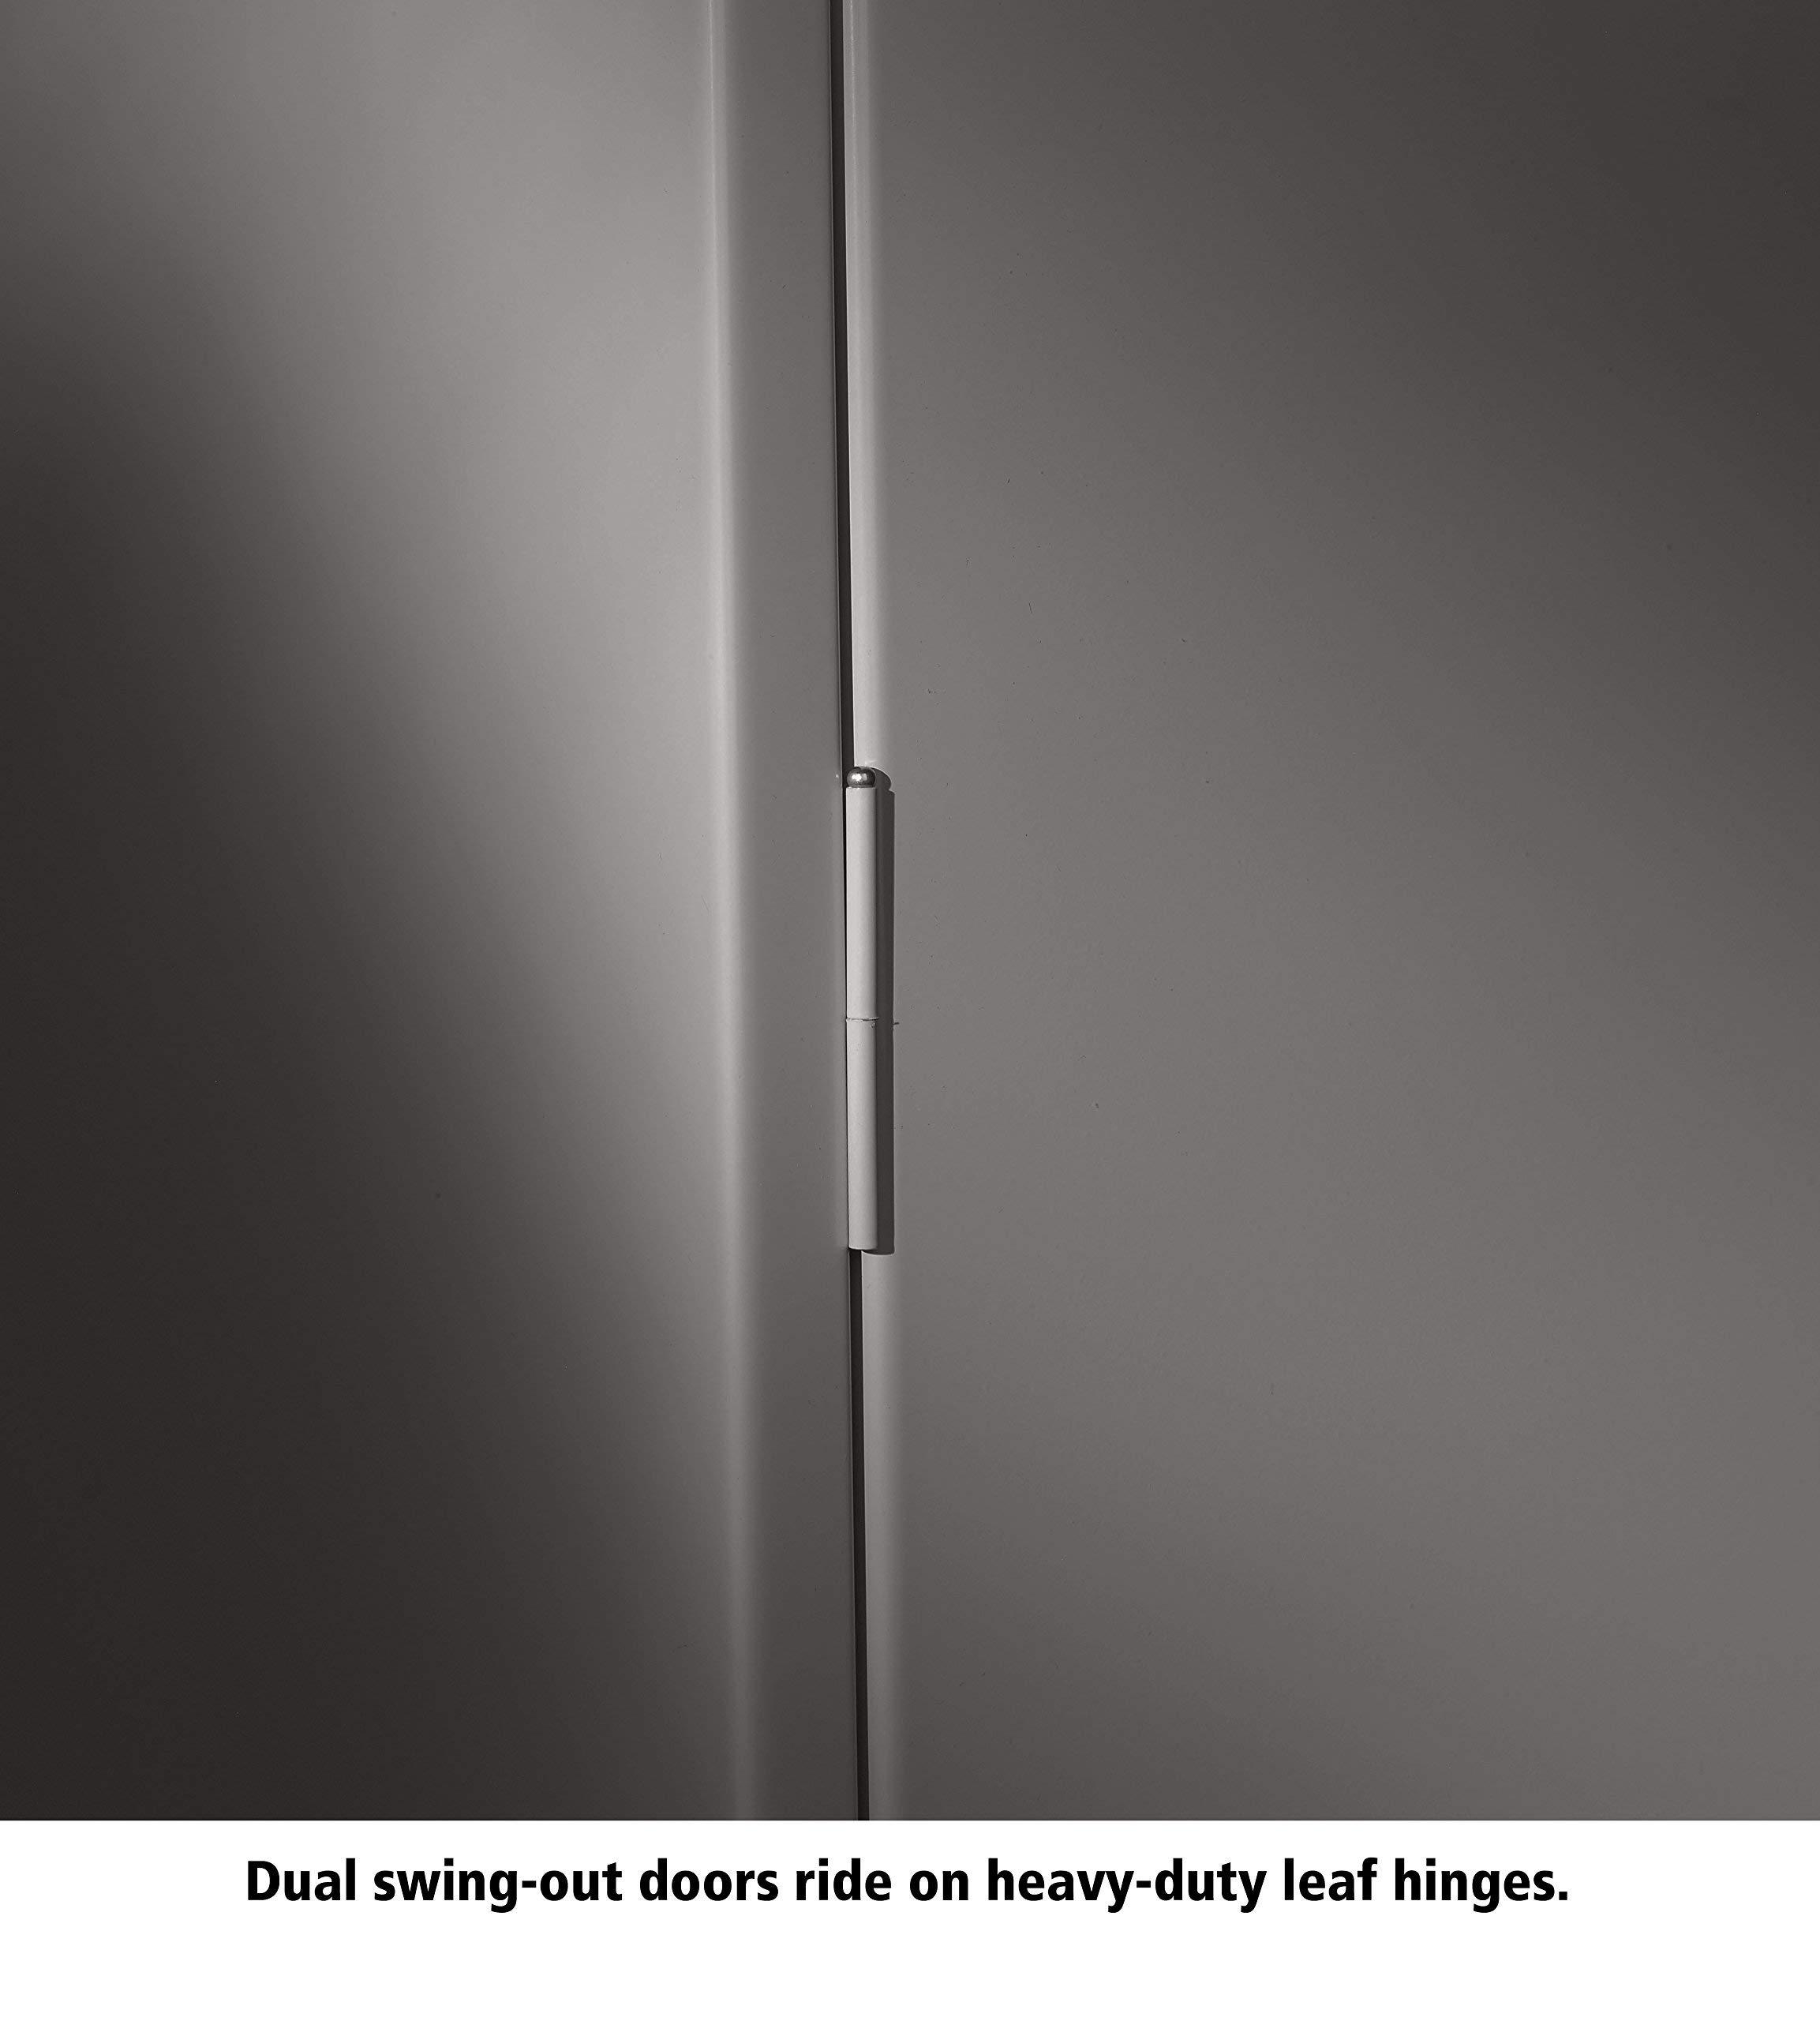 Tennsco 4218 24 Gauge Steel Standard Welded Counter High Cabinet, 2 Shelves, 150 lbs Capacity per Shelf, 36'' Width x 42'' Height x 18'' Depth, Black (Renewed) by Tennsco (Image #2)